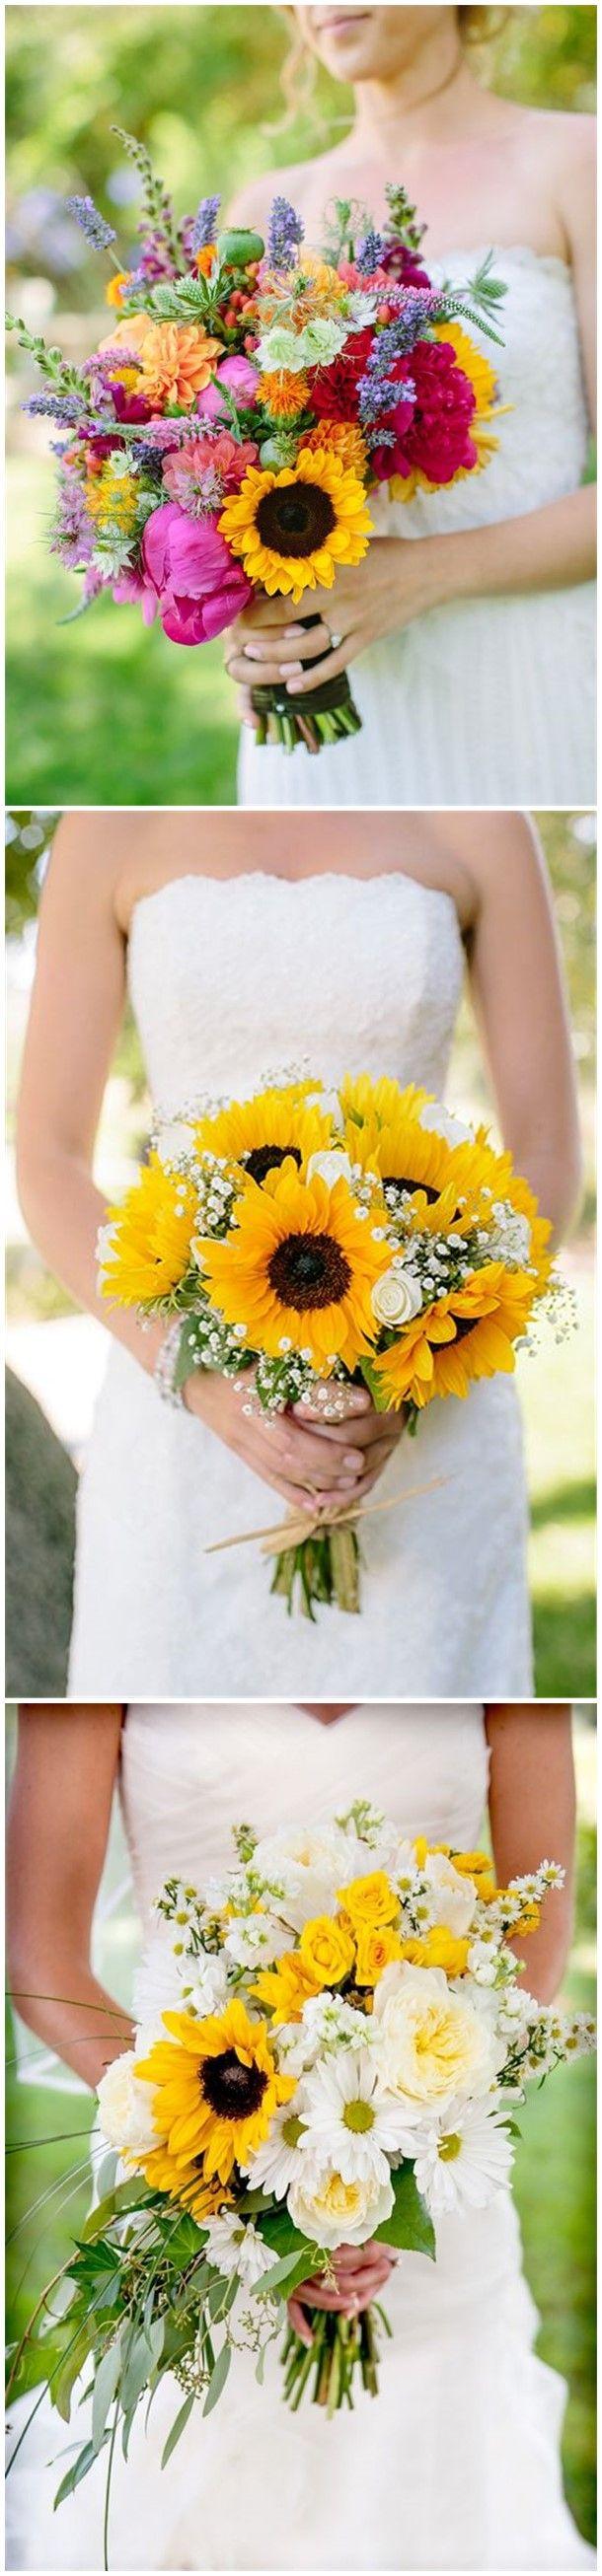 Wedding ideas for summer   Perfect Sunflower Wedding Bouquet Ideas for Summer Wedding